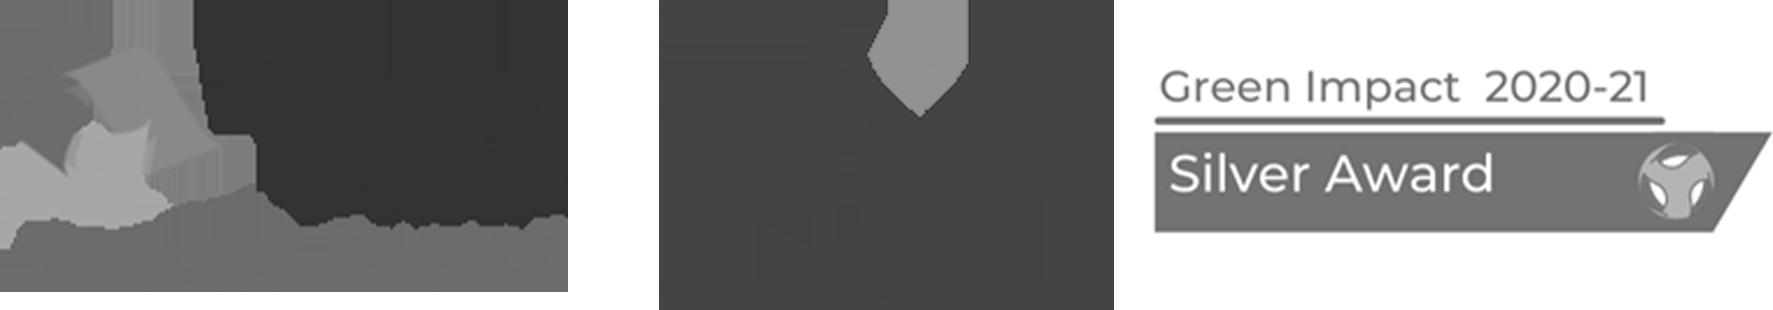 Athena Swan Bronze Award, HR Excellence in Research Award, Green Impact Silver Award